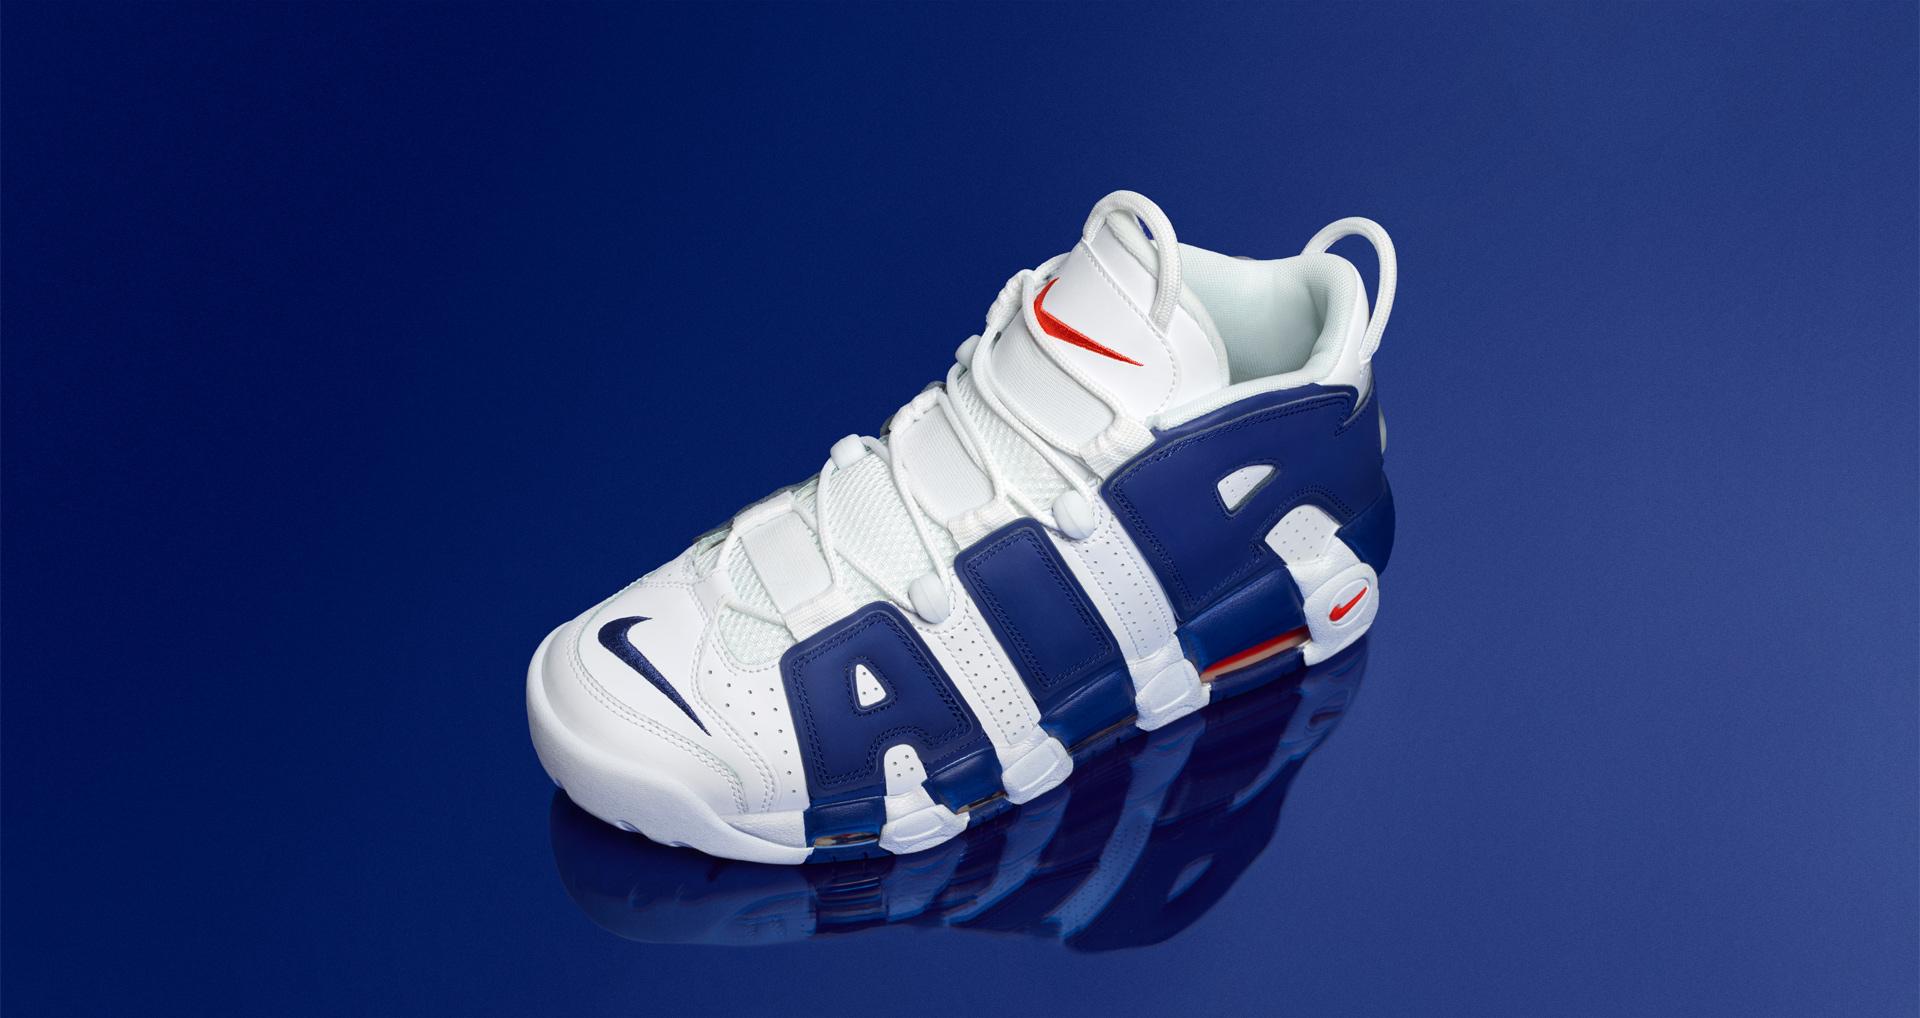 Nike Air More Uptempo 96 Knicks